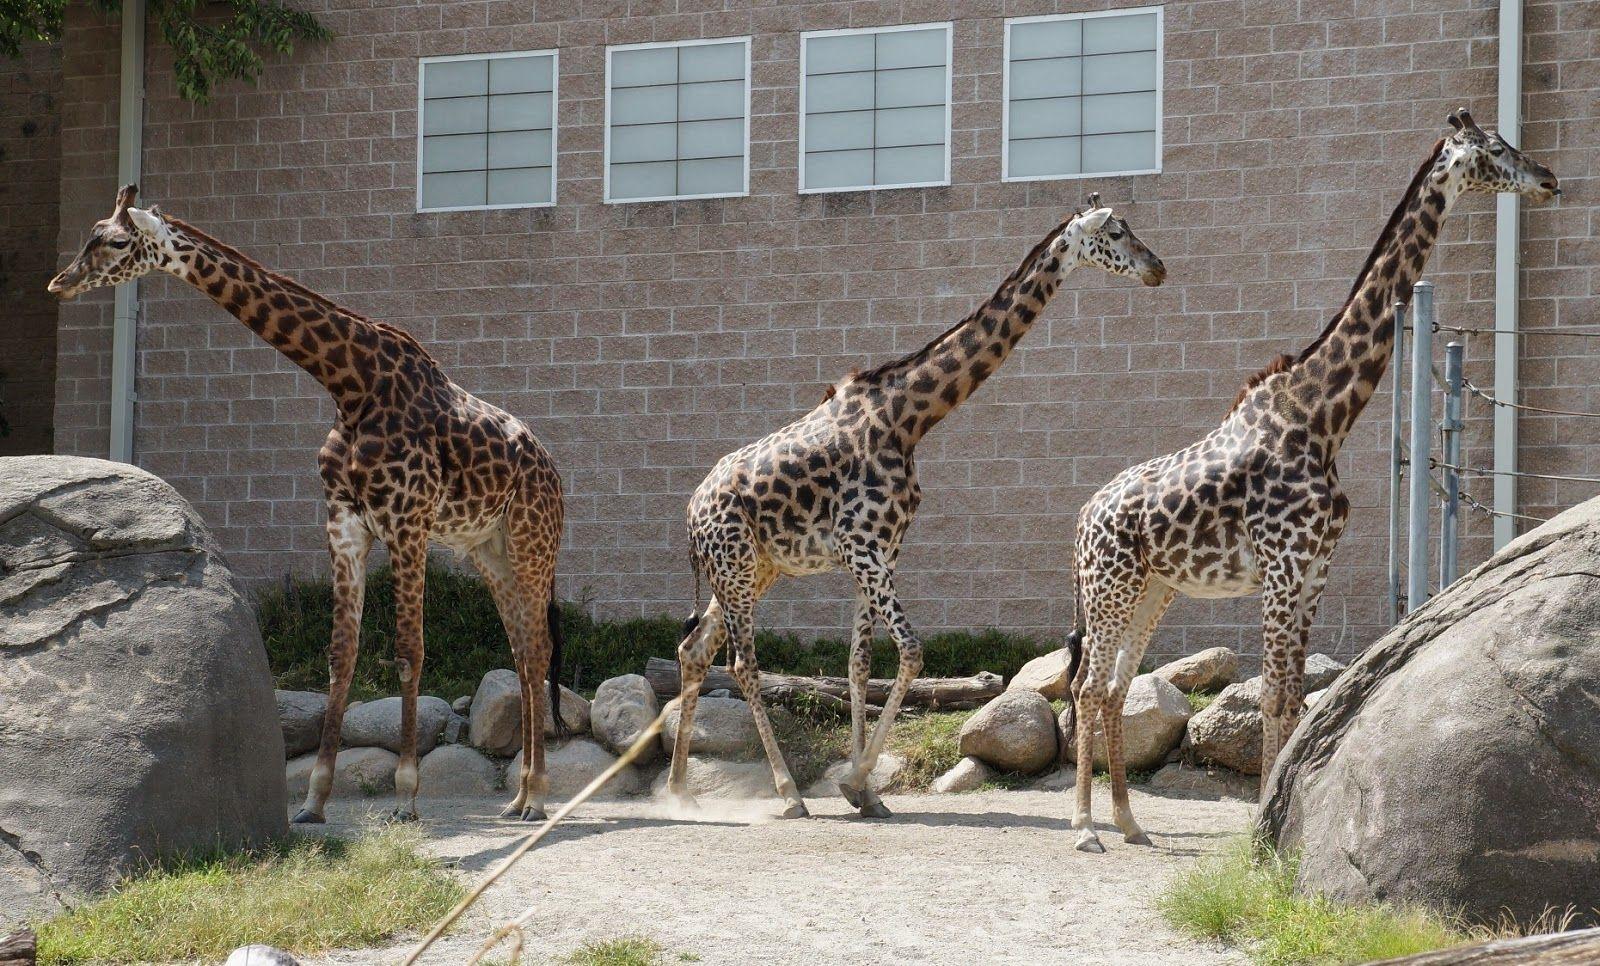 8/8/14 Roger Williams Zoo Alex and Ani Farmyard Farm